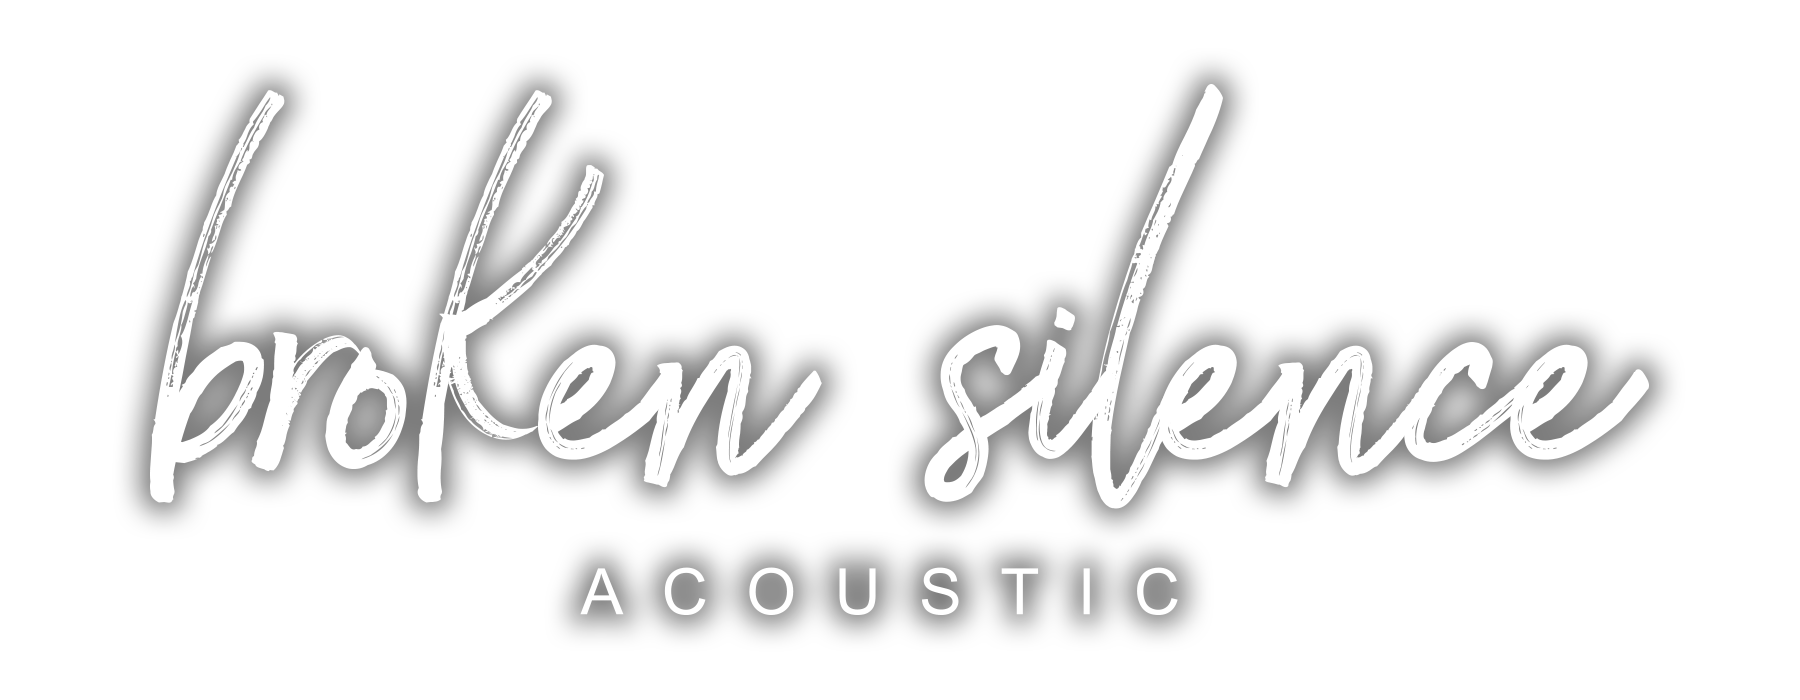 Broken Silence Acoustic - Band